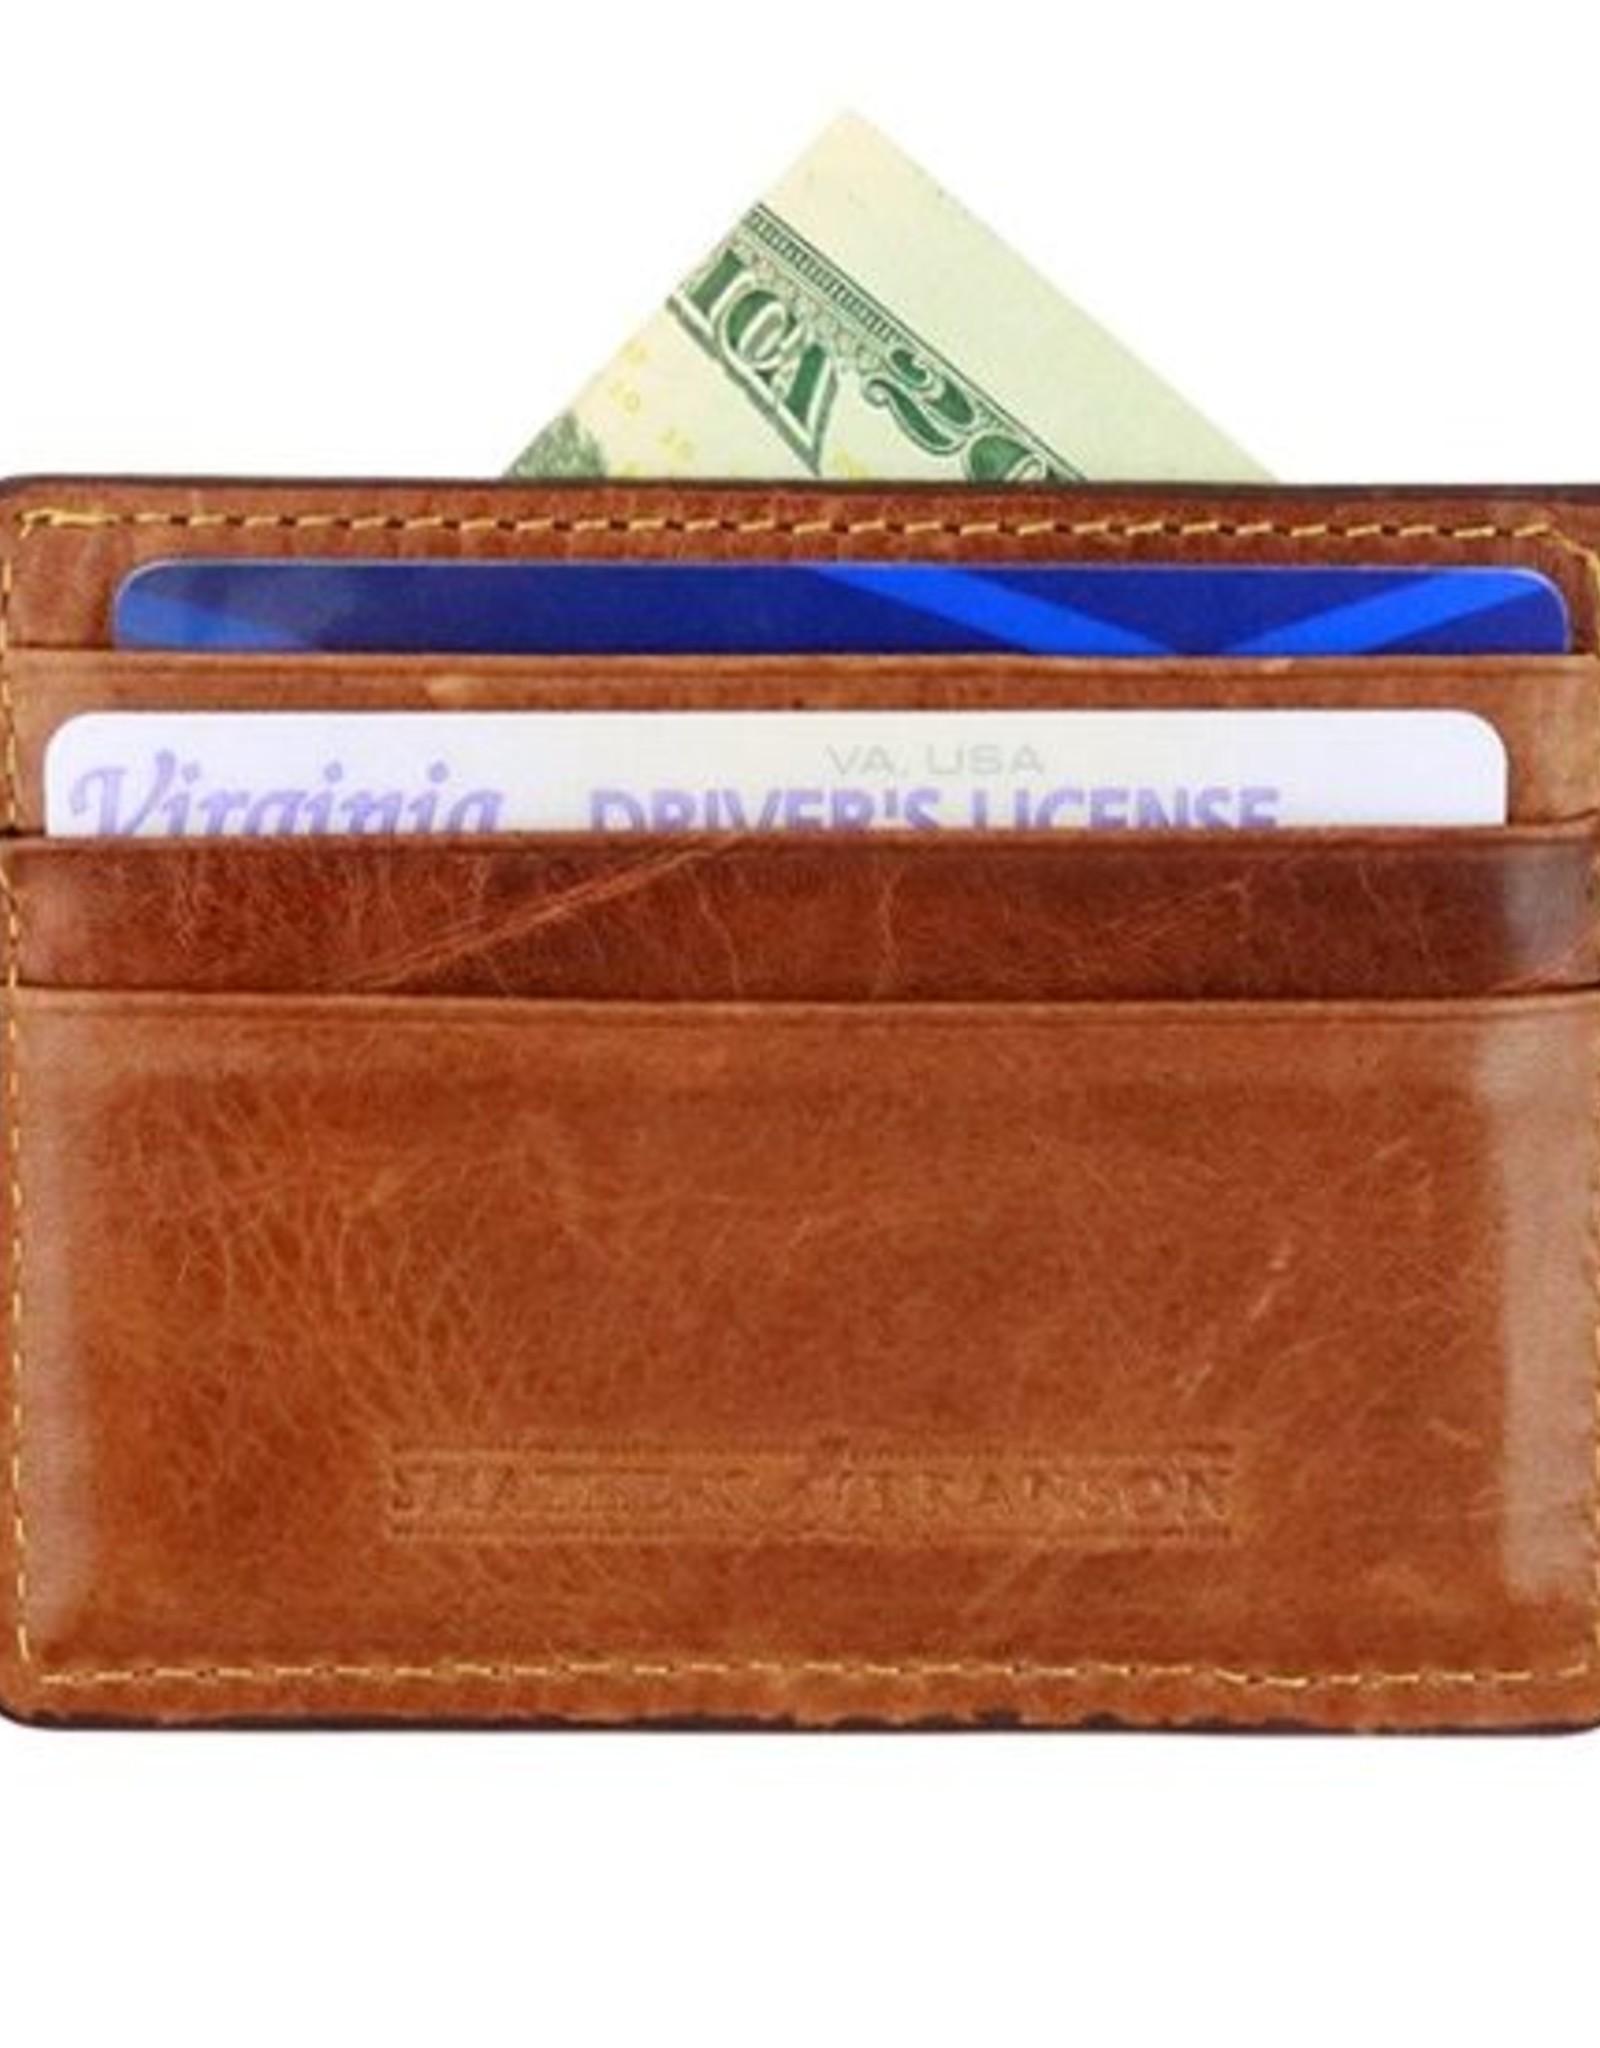 Smathers & Branson Black Watch Needlepoint Card Wallet